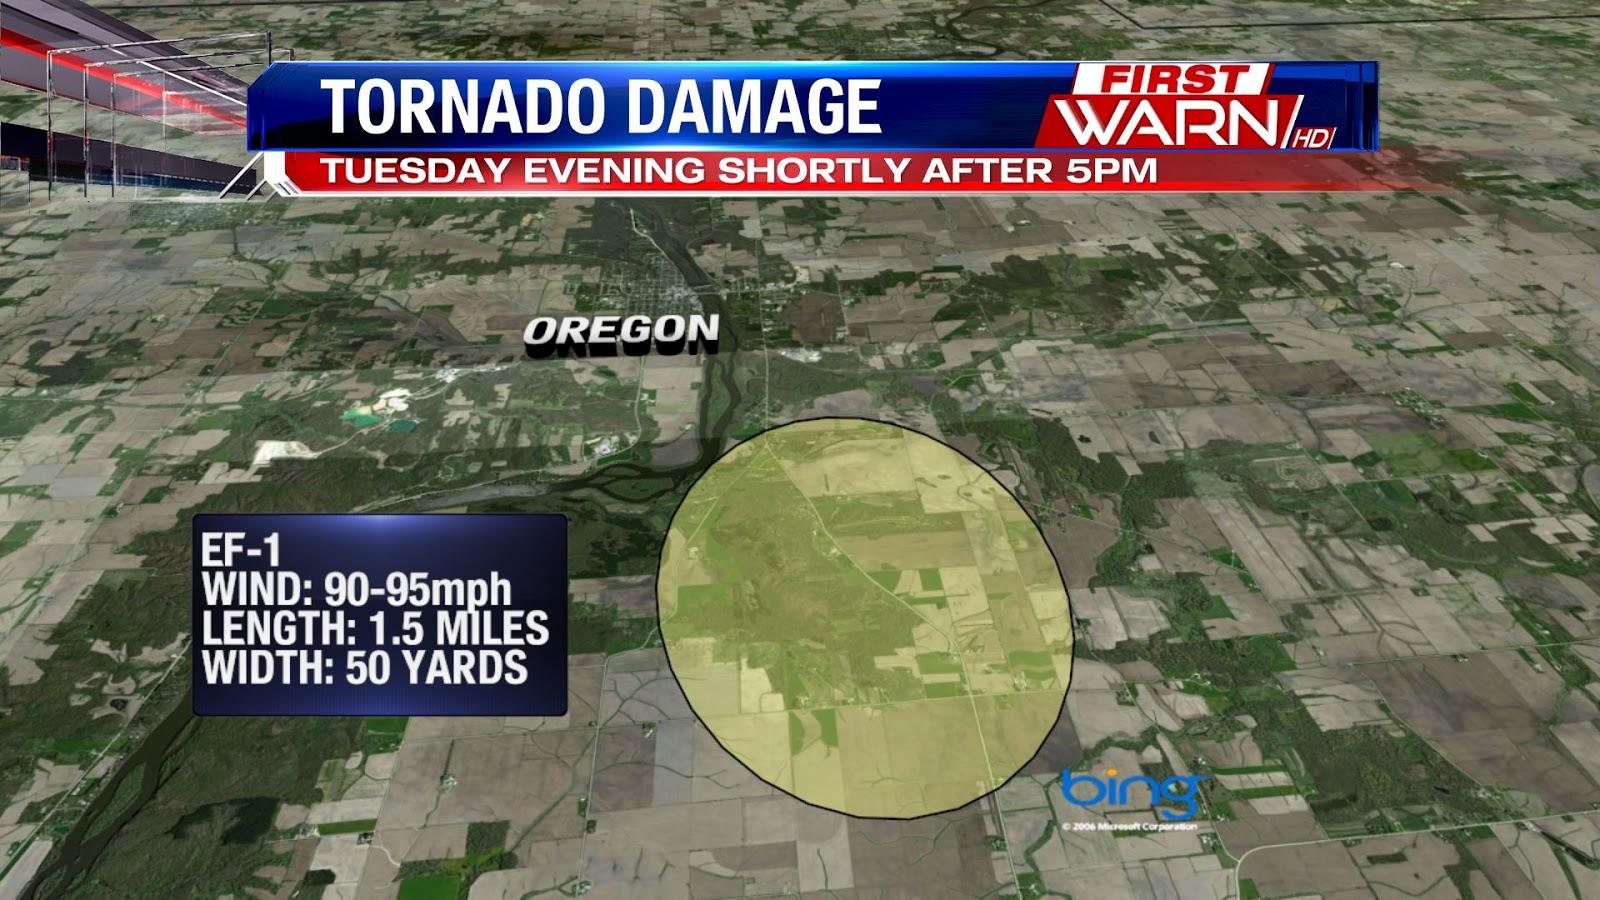 First Warn Weather Team Confirmed Tornado Near Oregon Il Tuesday